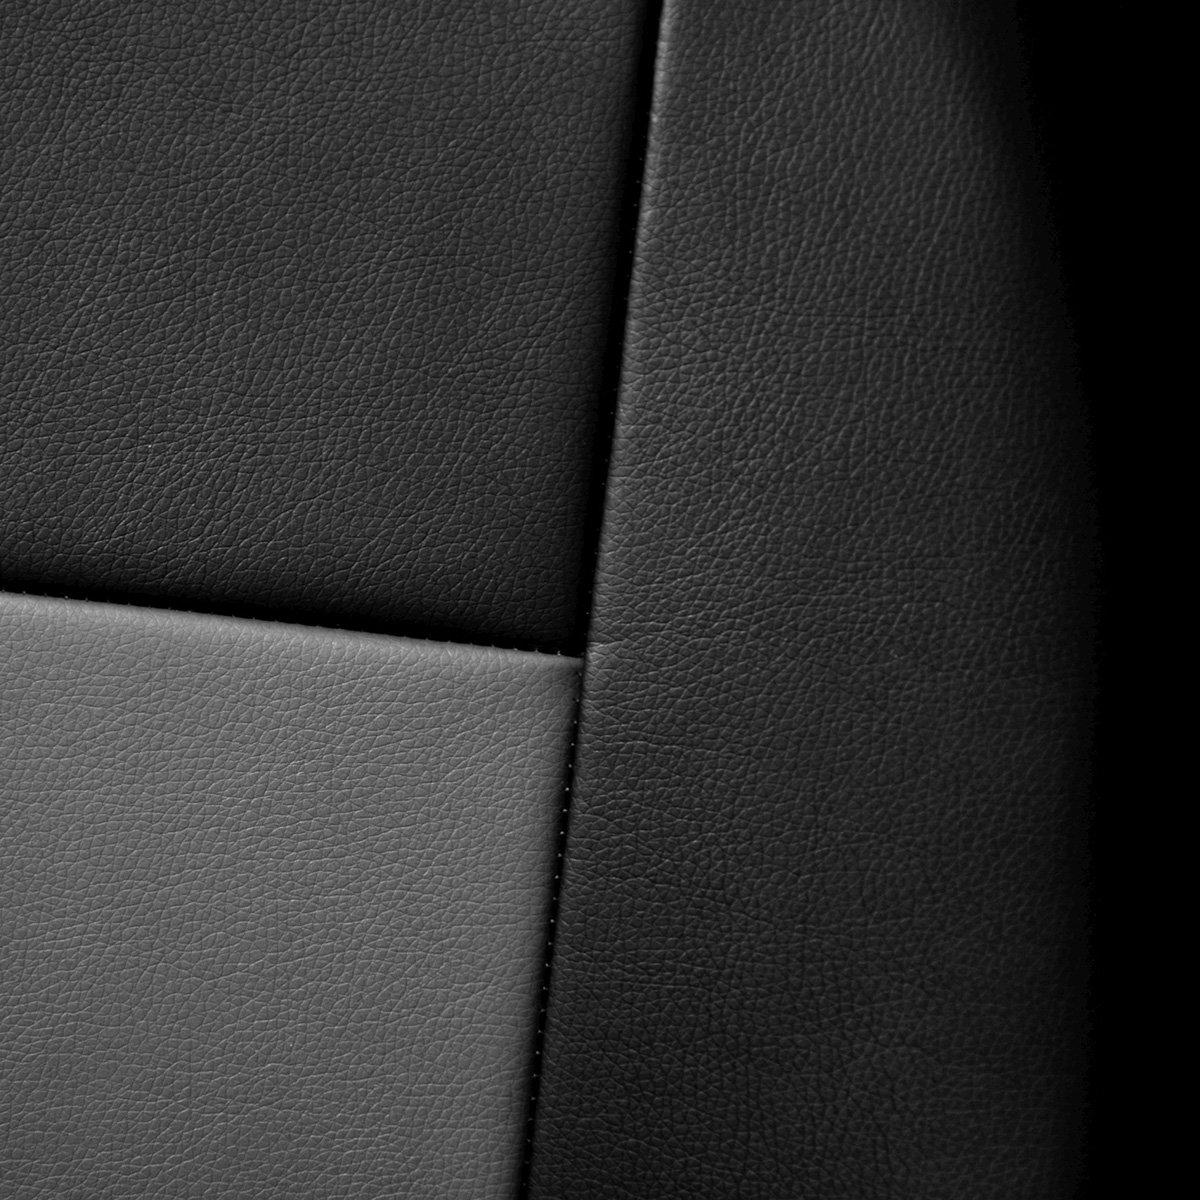 5902538300513 Kunstleder Mossa cm-G Universal Auto schonbezug Set